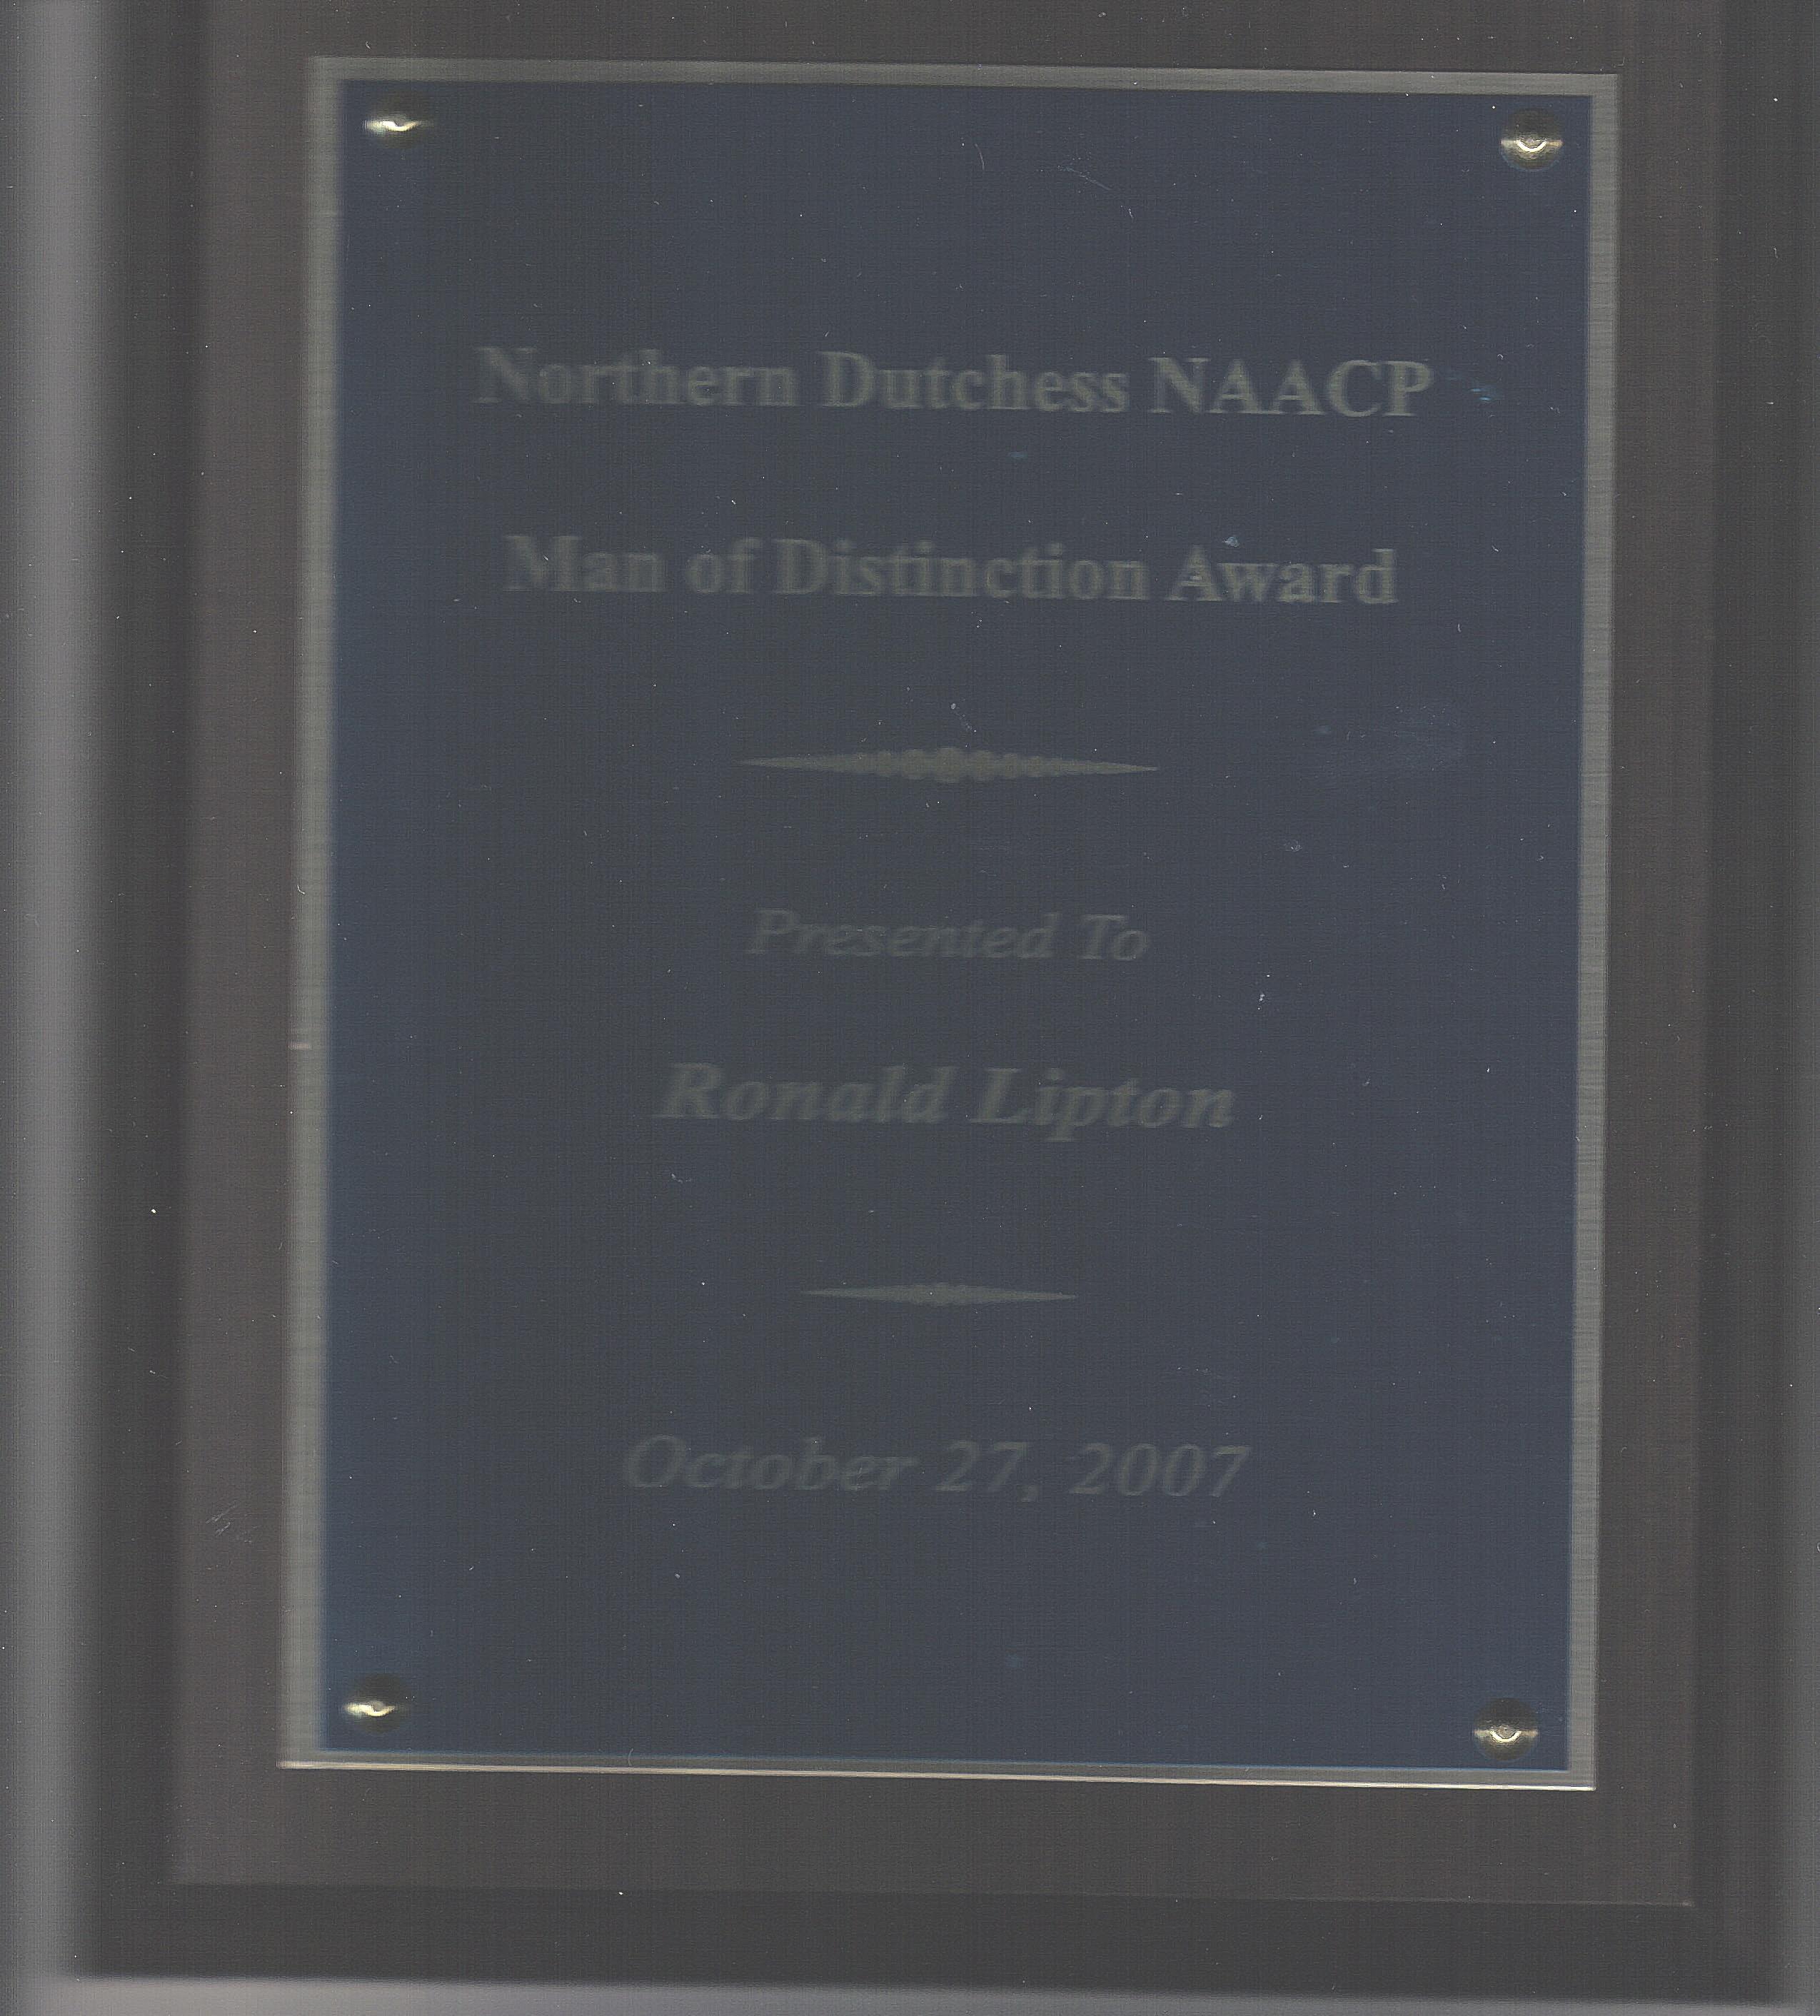 NAACP AWARD 3.jpg